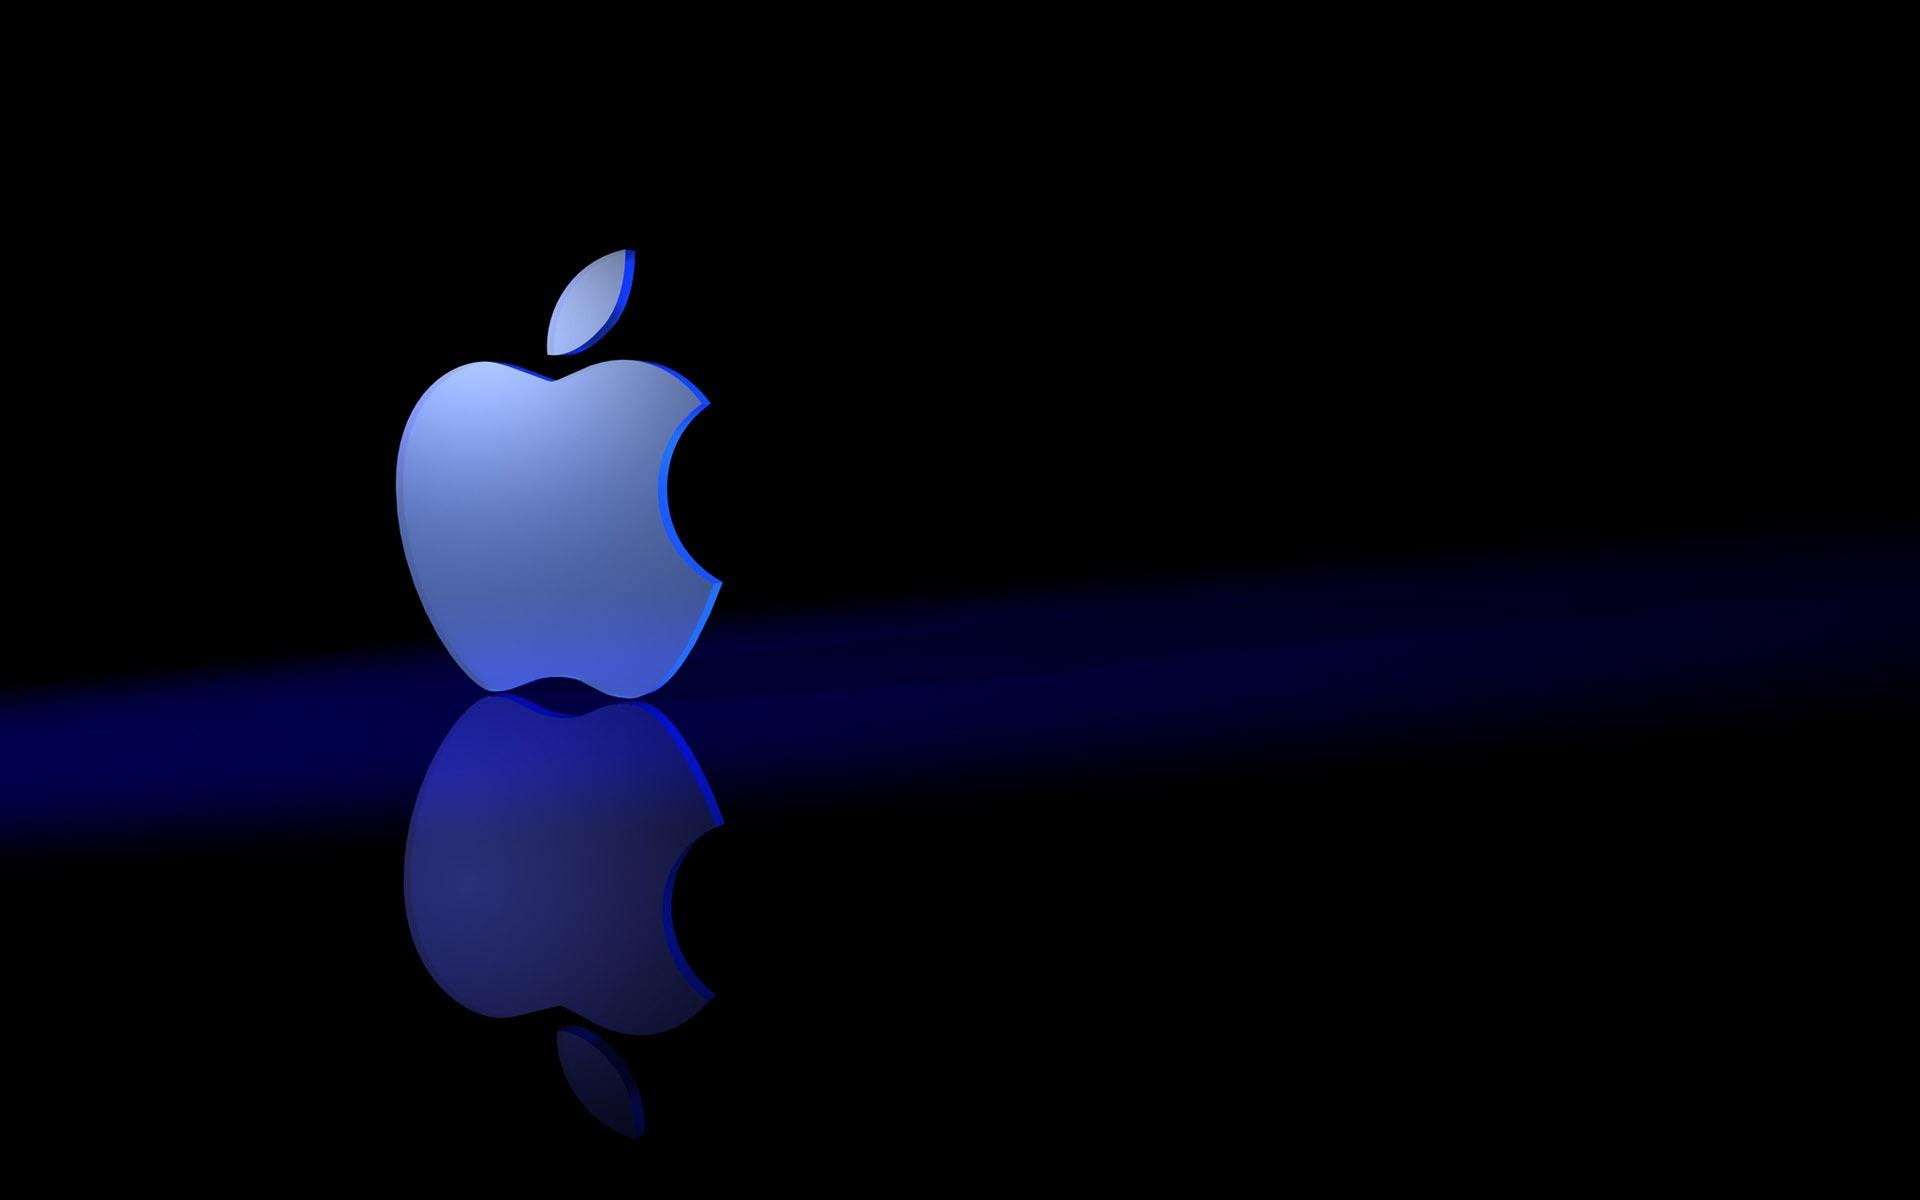 HD Apple In A Blue Shade Wallpaper